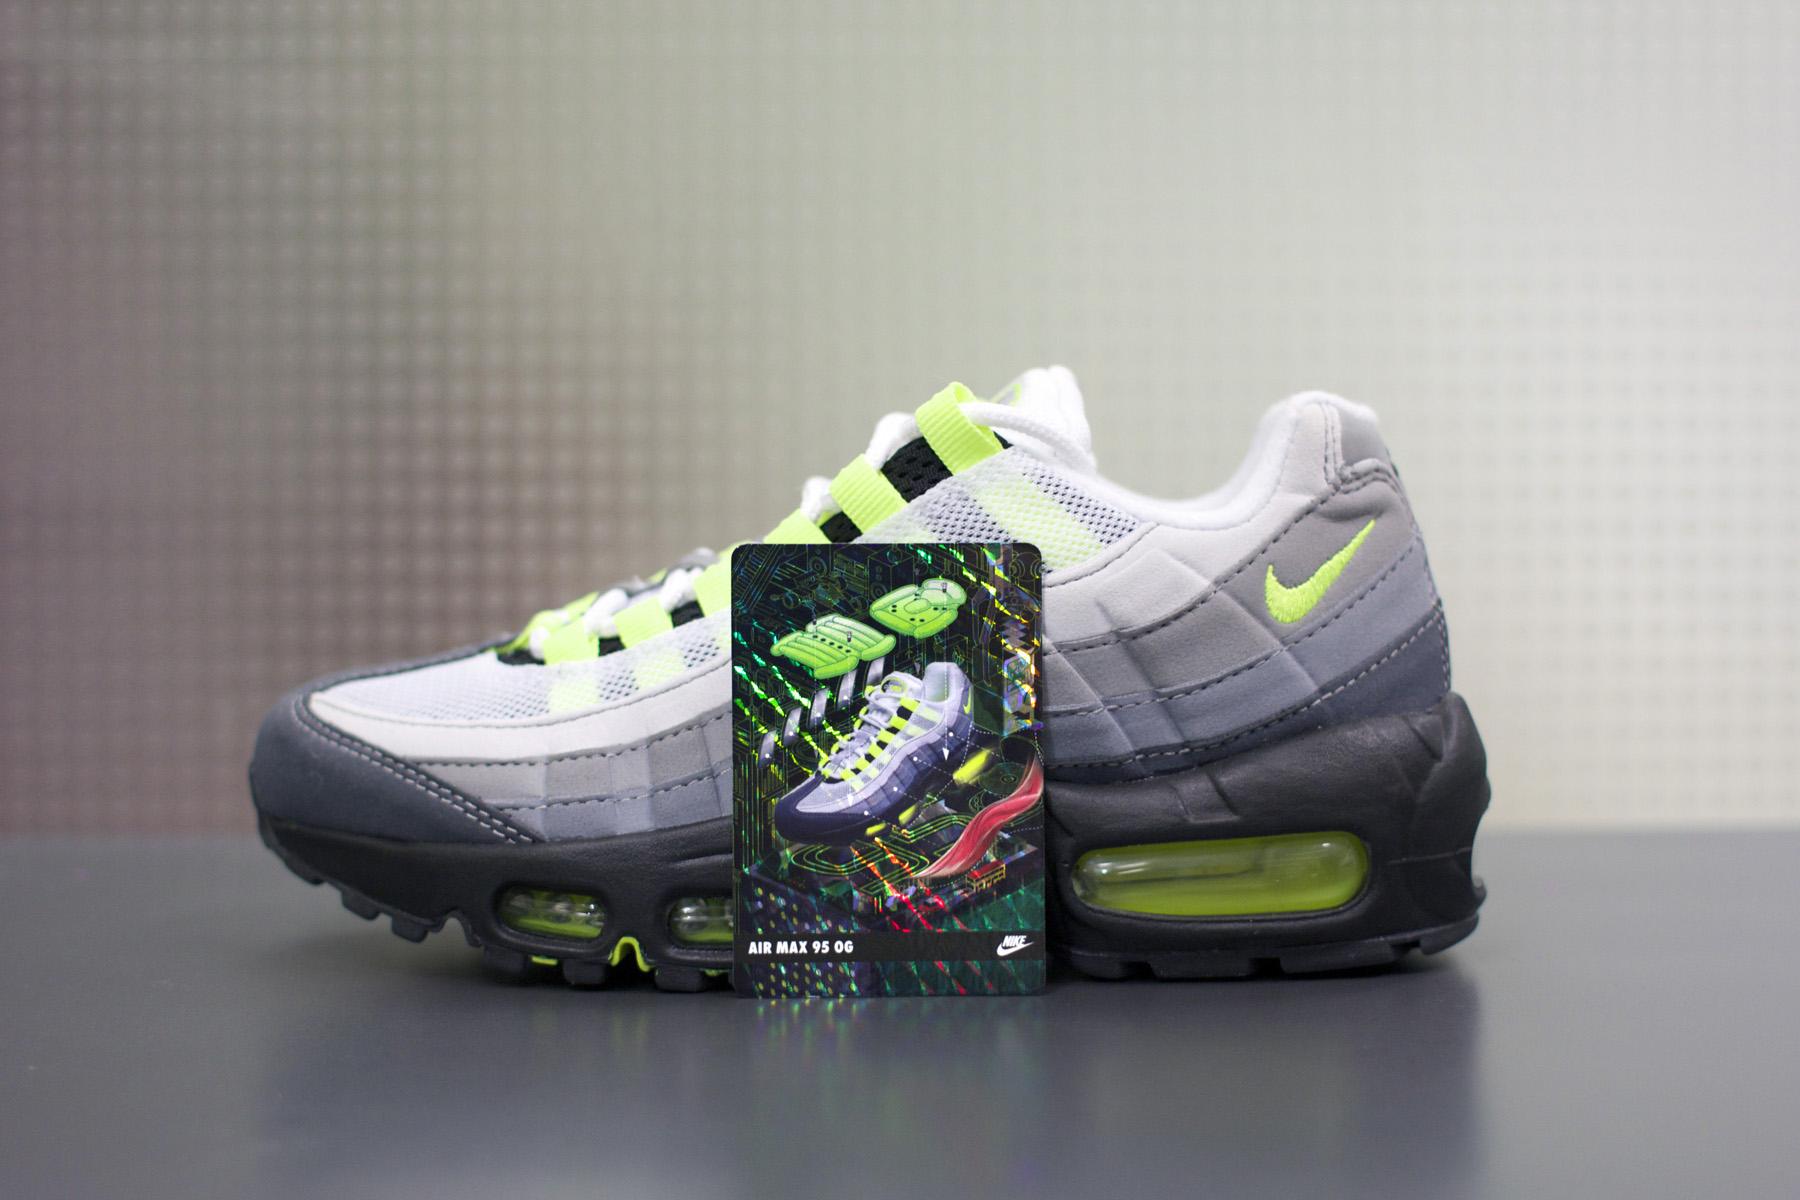 Nike_AM95_06.jpg